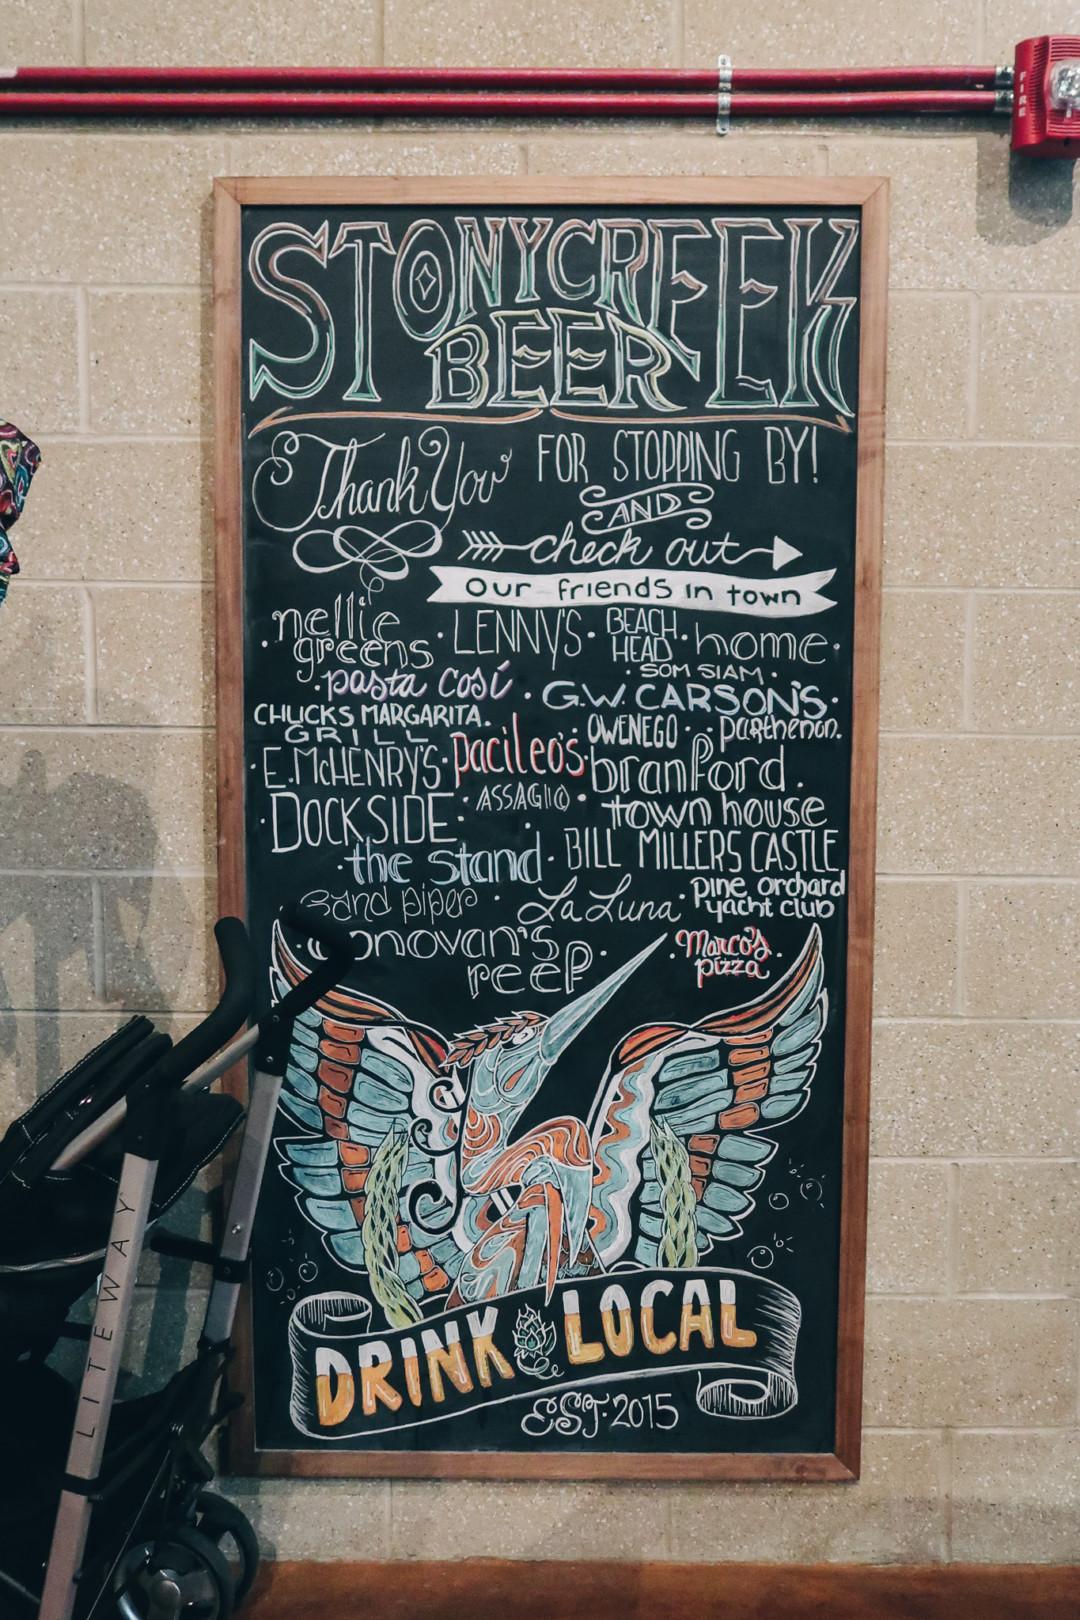 Chalkboard design at Stony Creek Brewery, Branford, CT